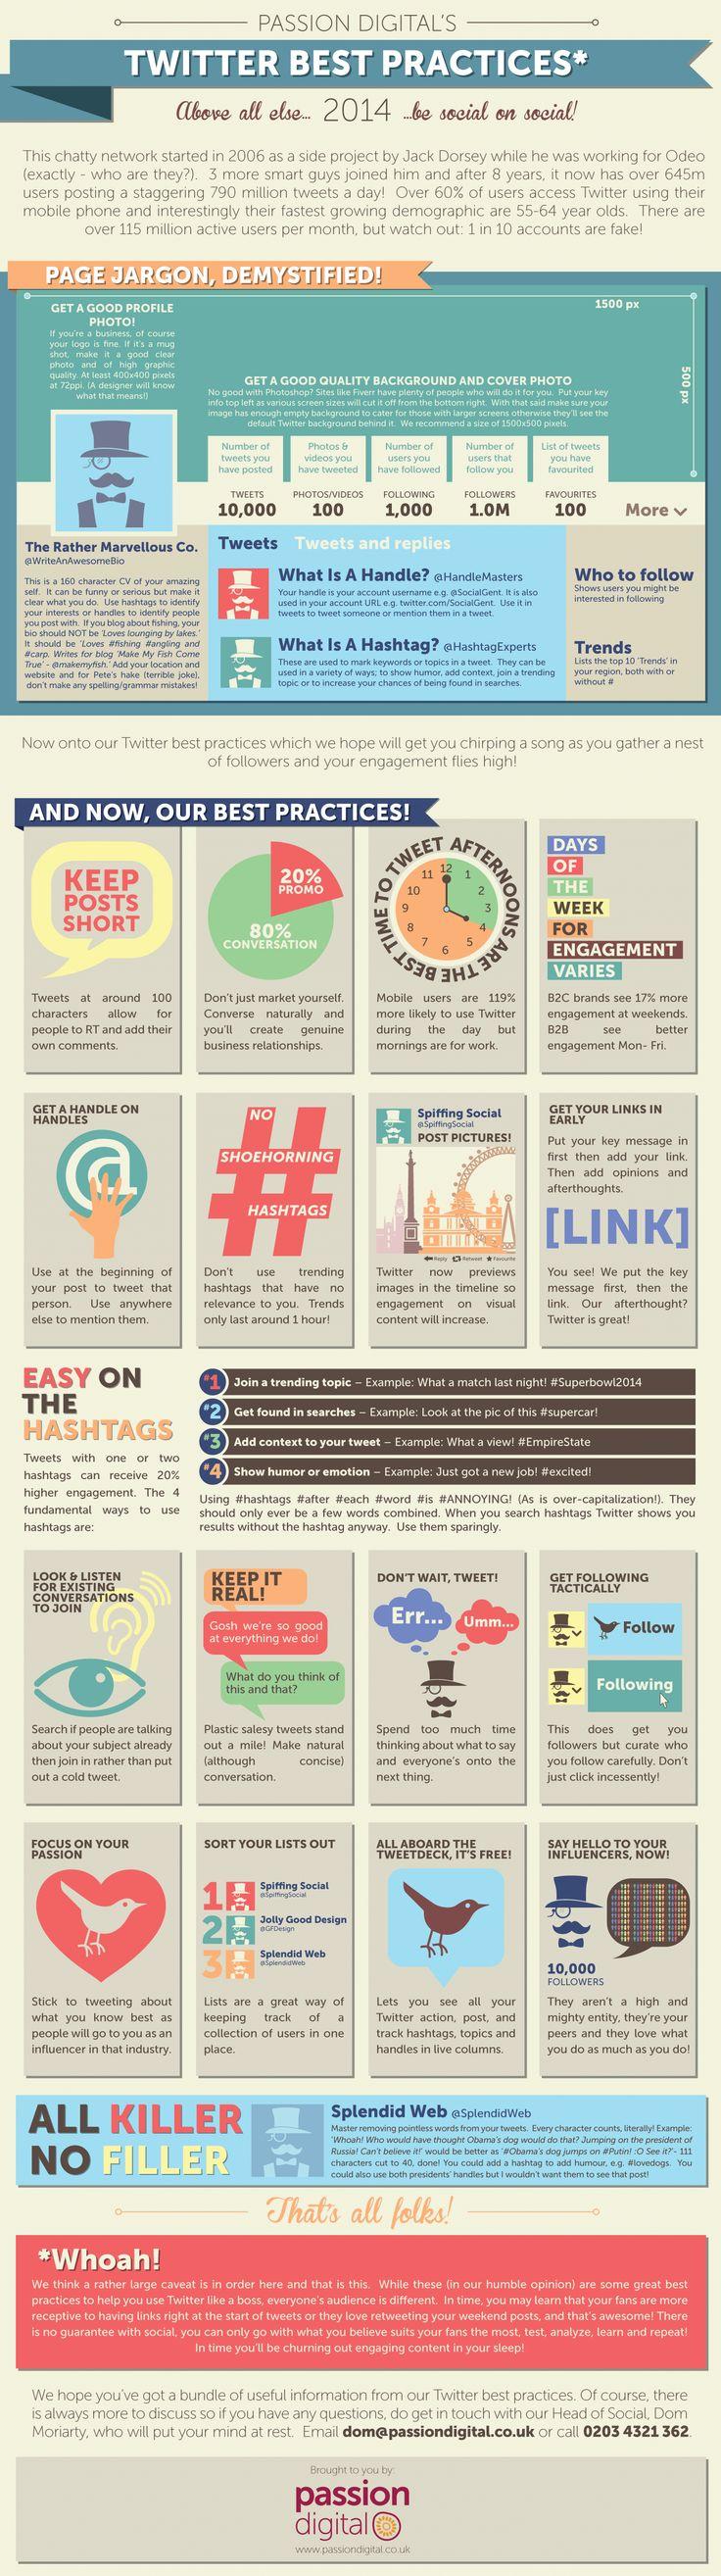 23 (Rather Marvellous) Twitter Best Practices